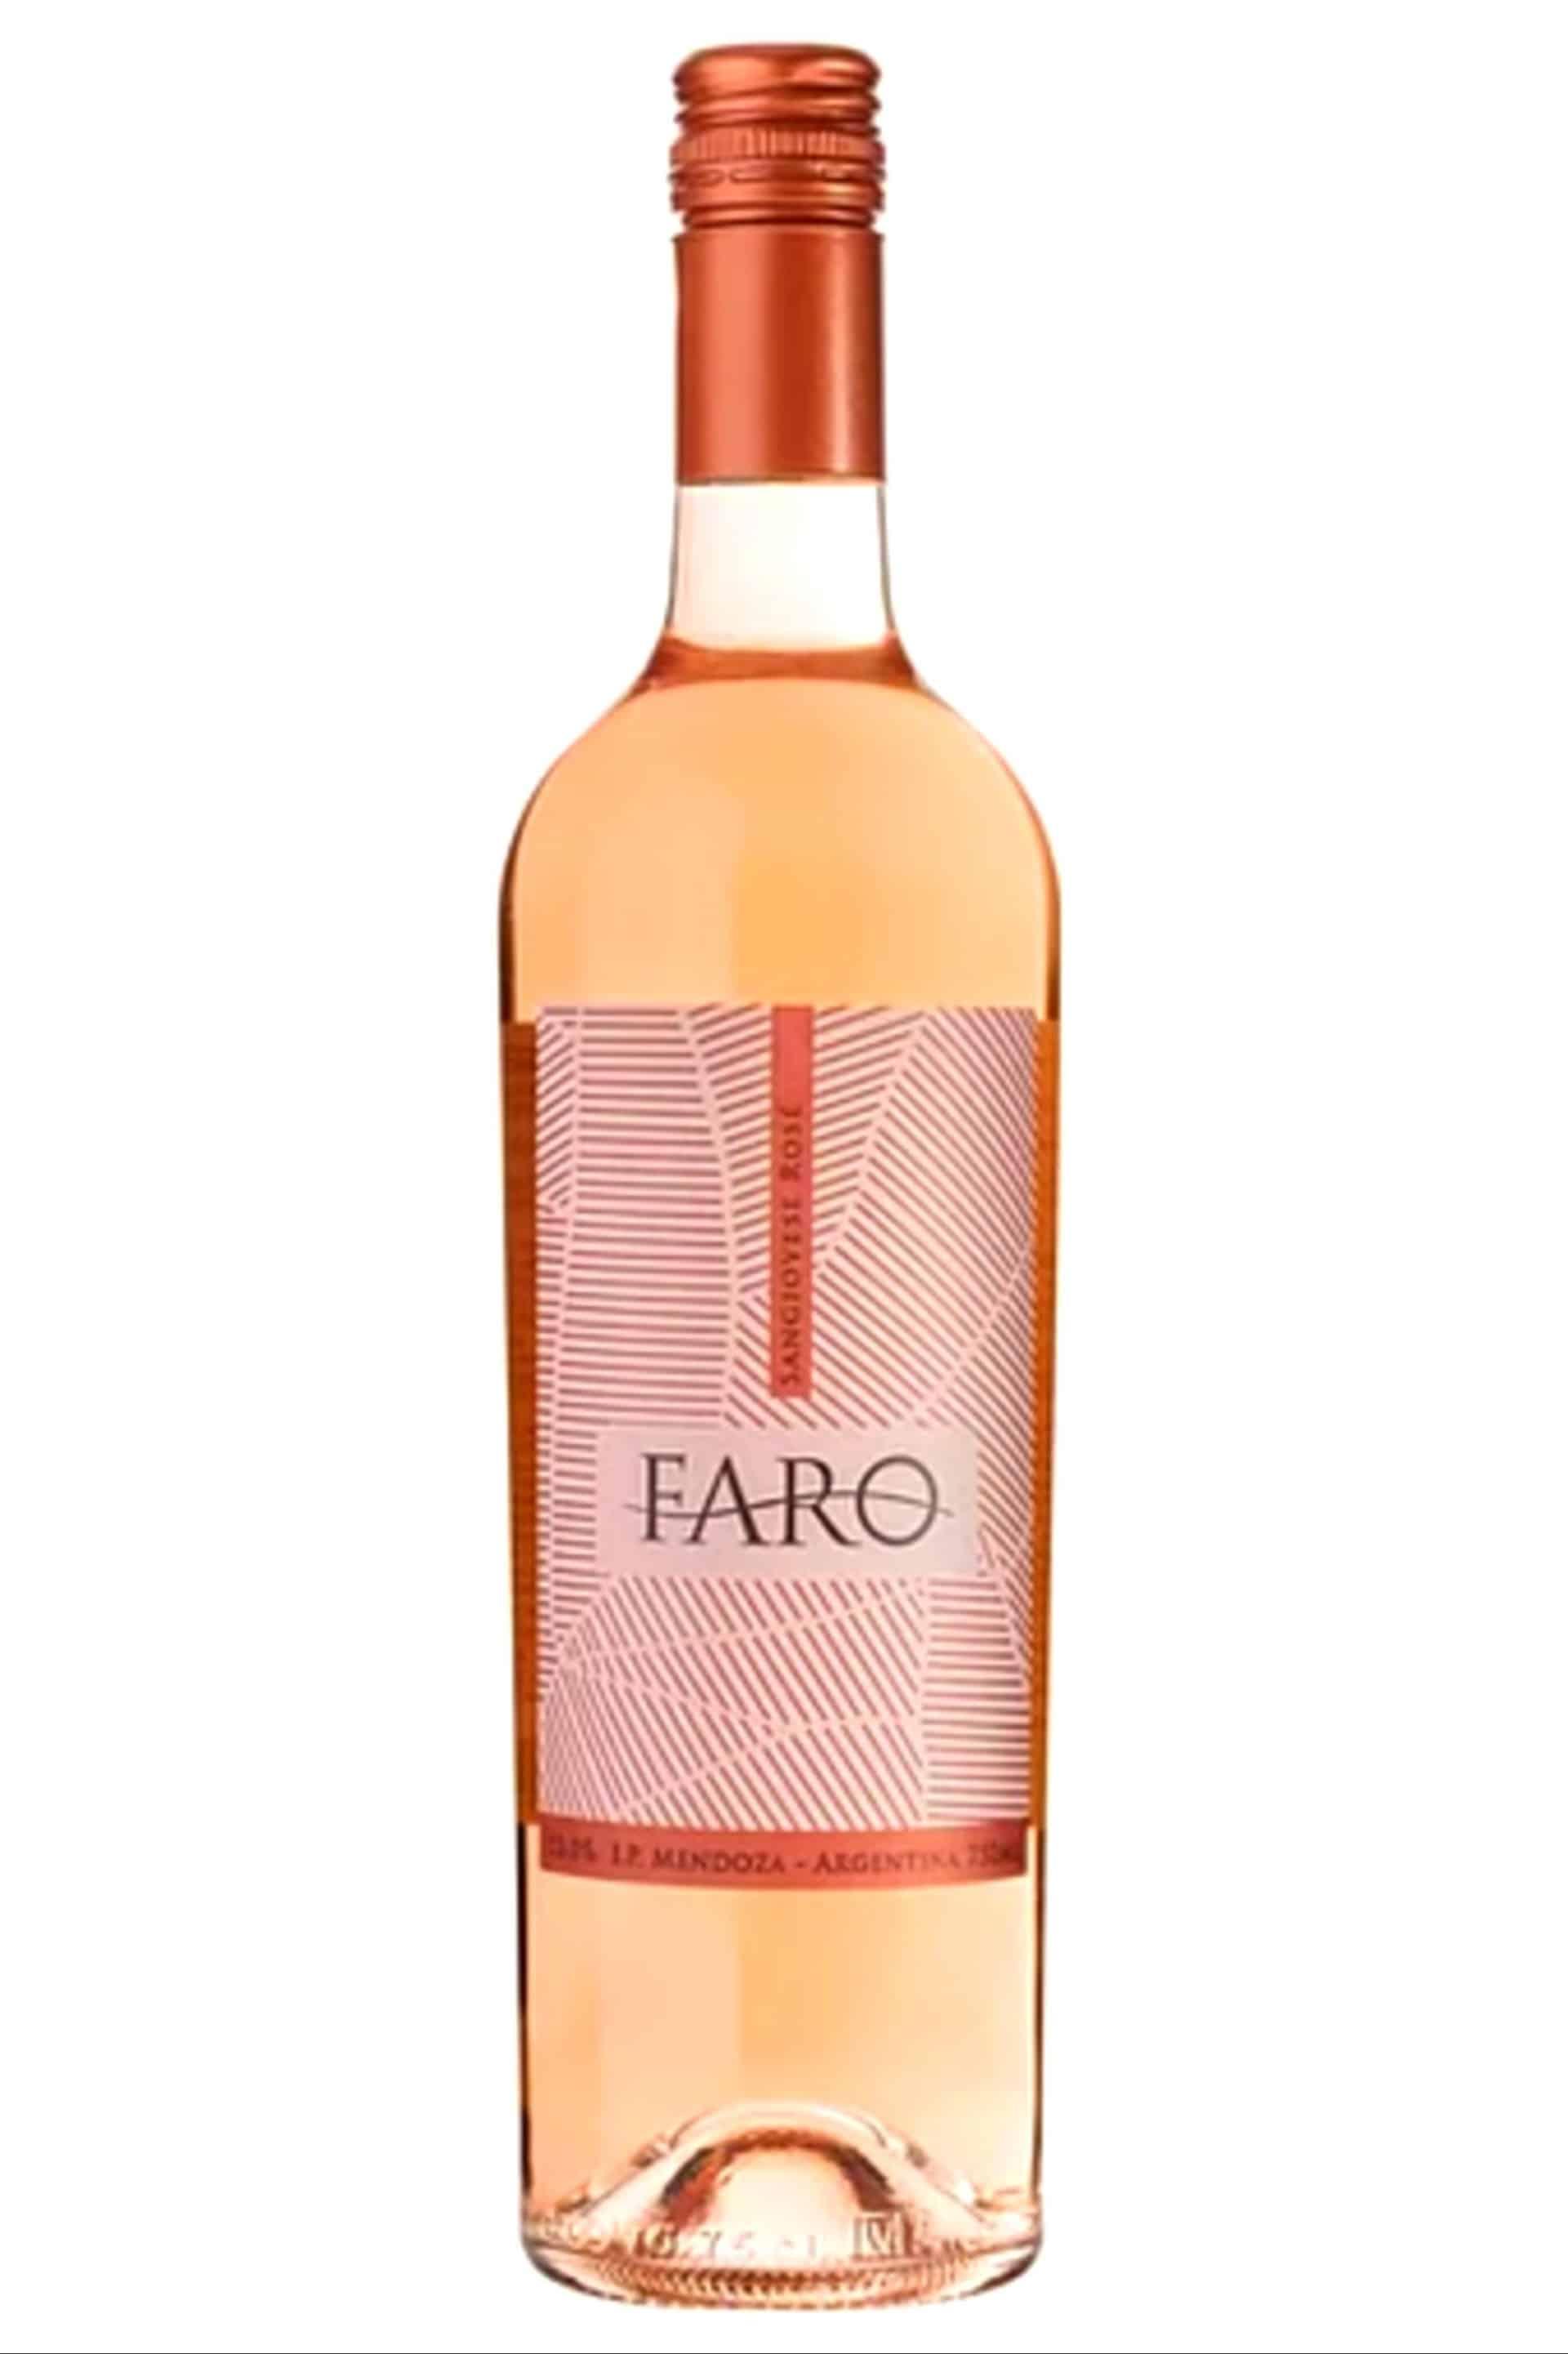 Vinho Faro Sangiovese Rosé 750ml